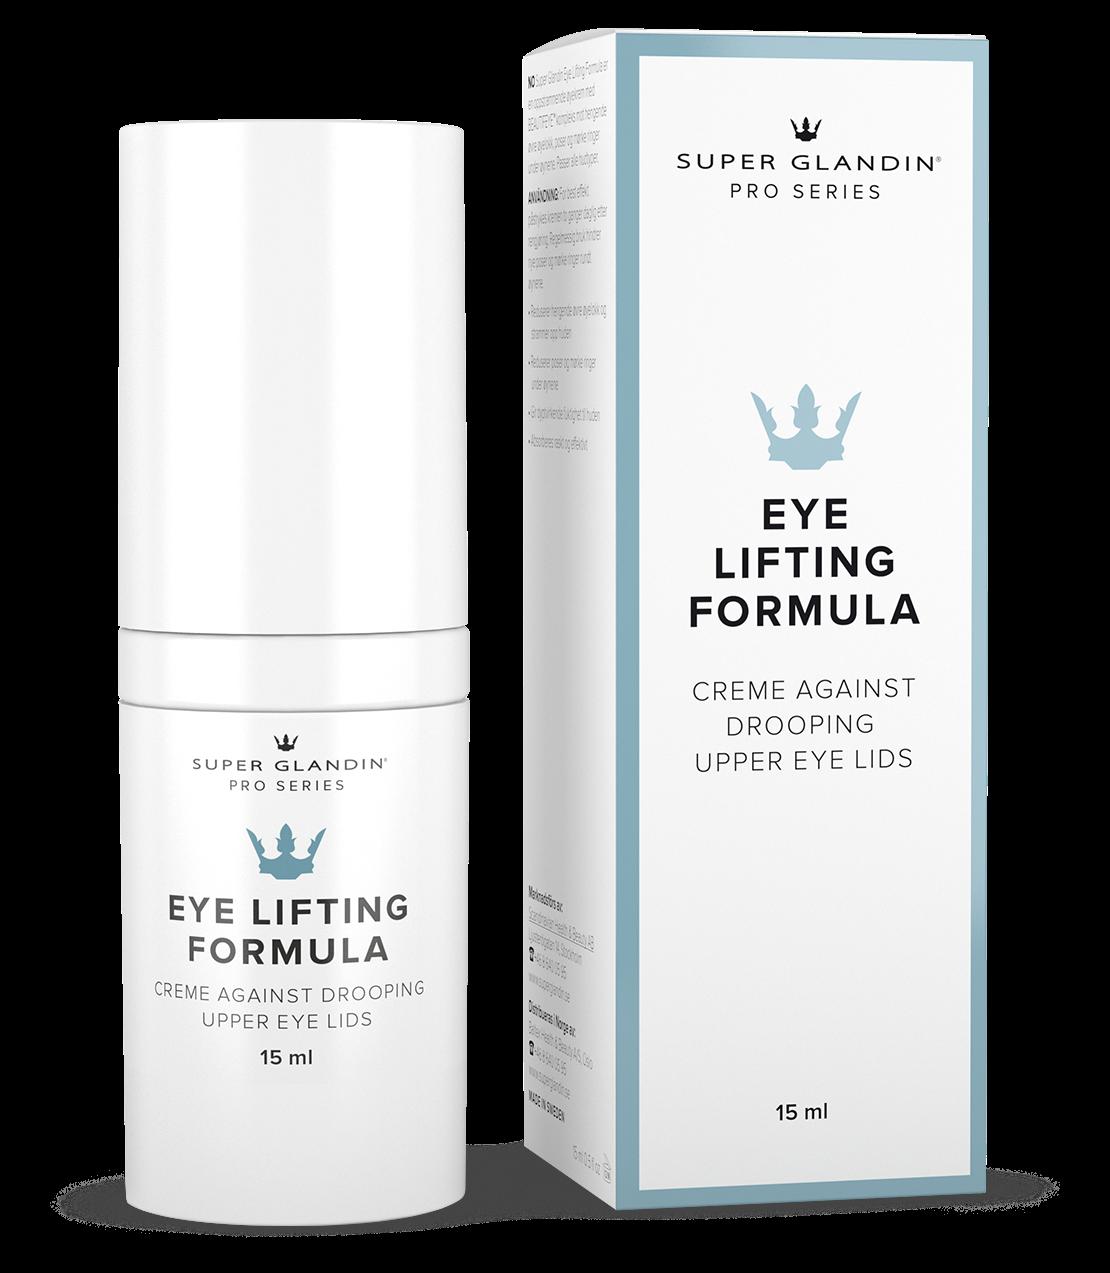 Eye Lifting Formula